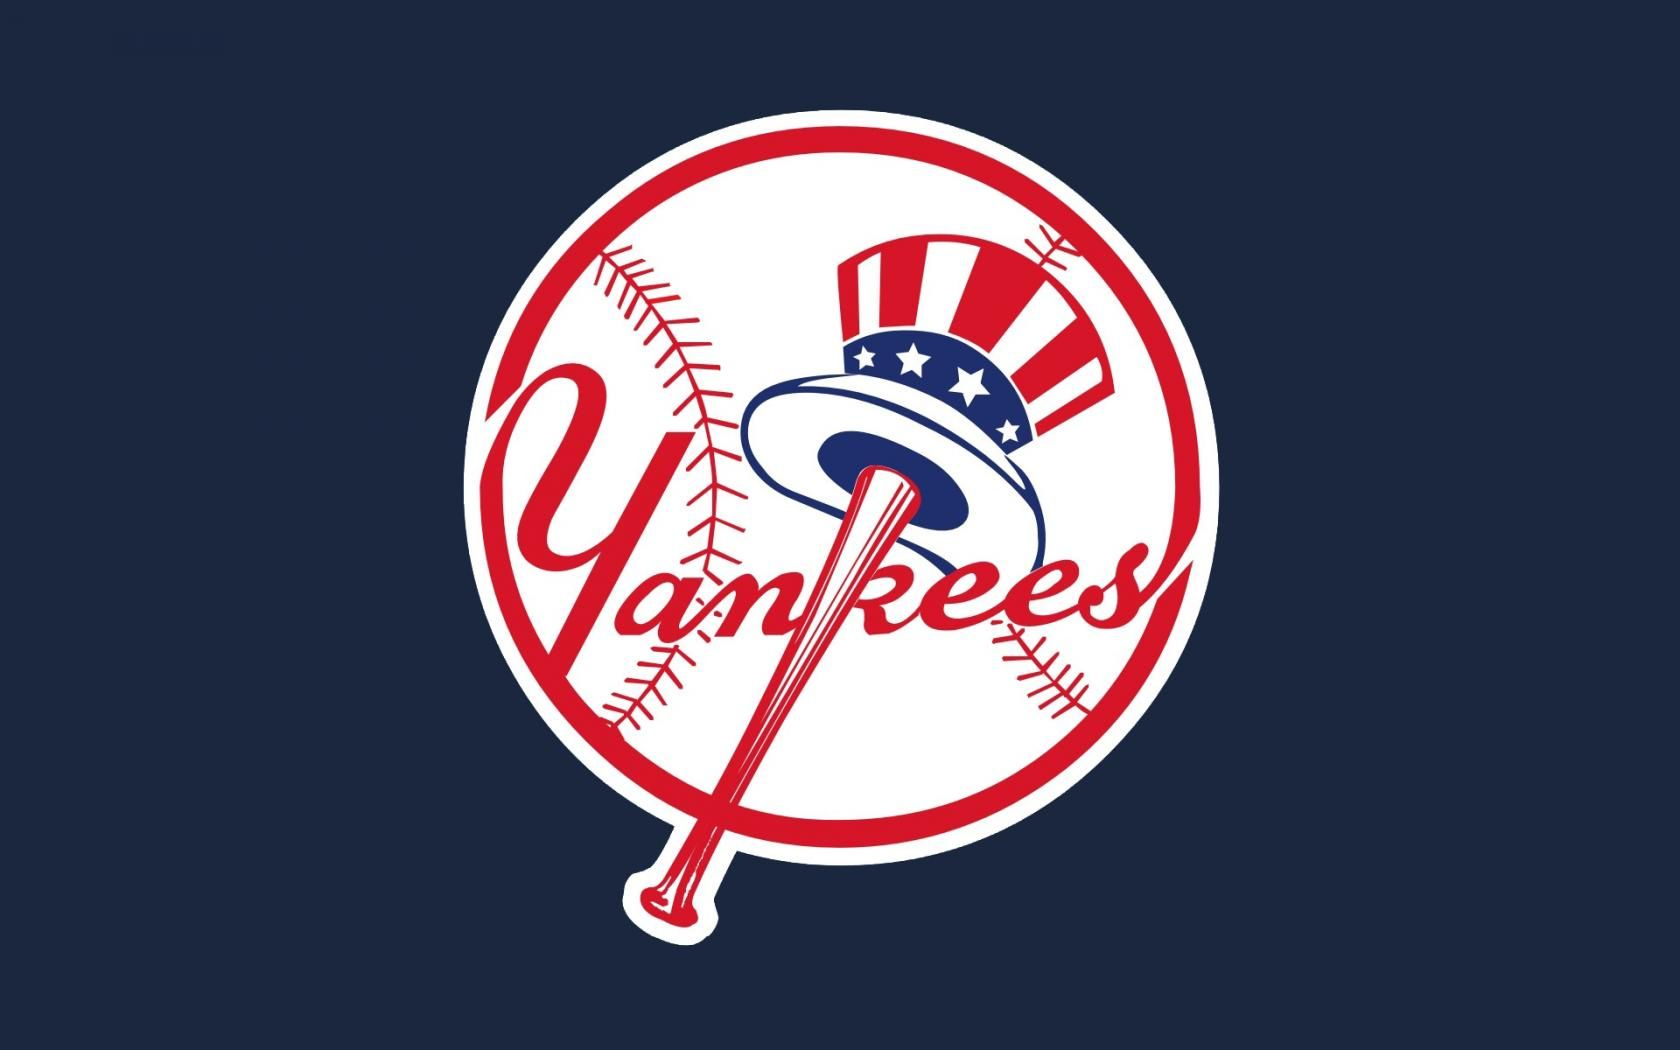 New York Yankees Backgrounds Wallpaper